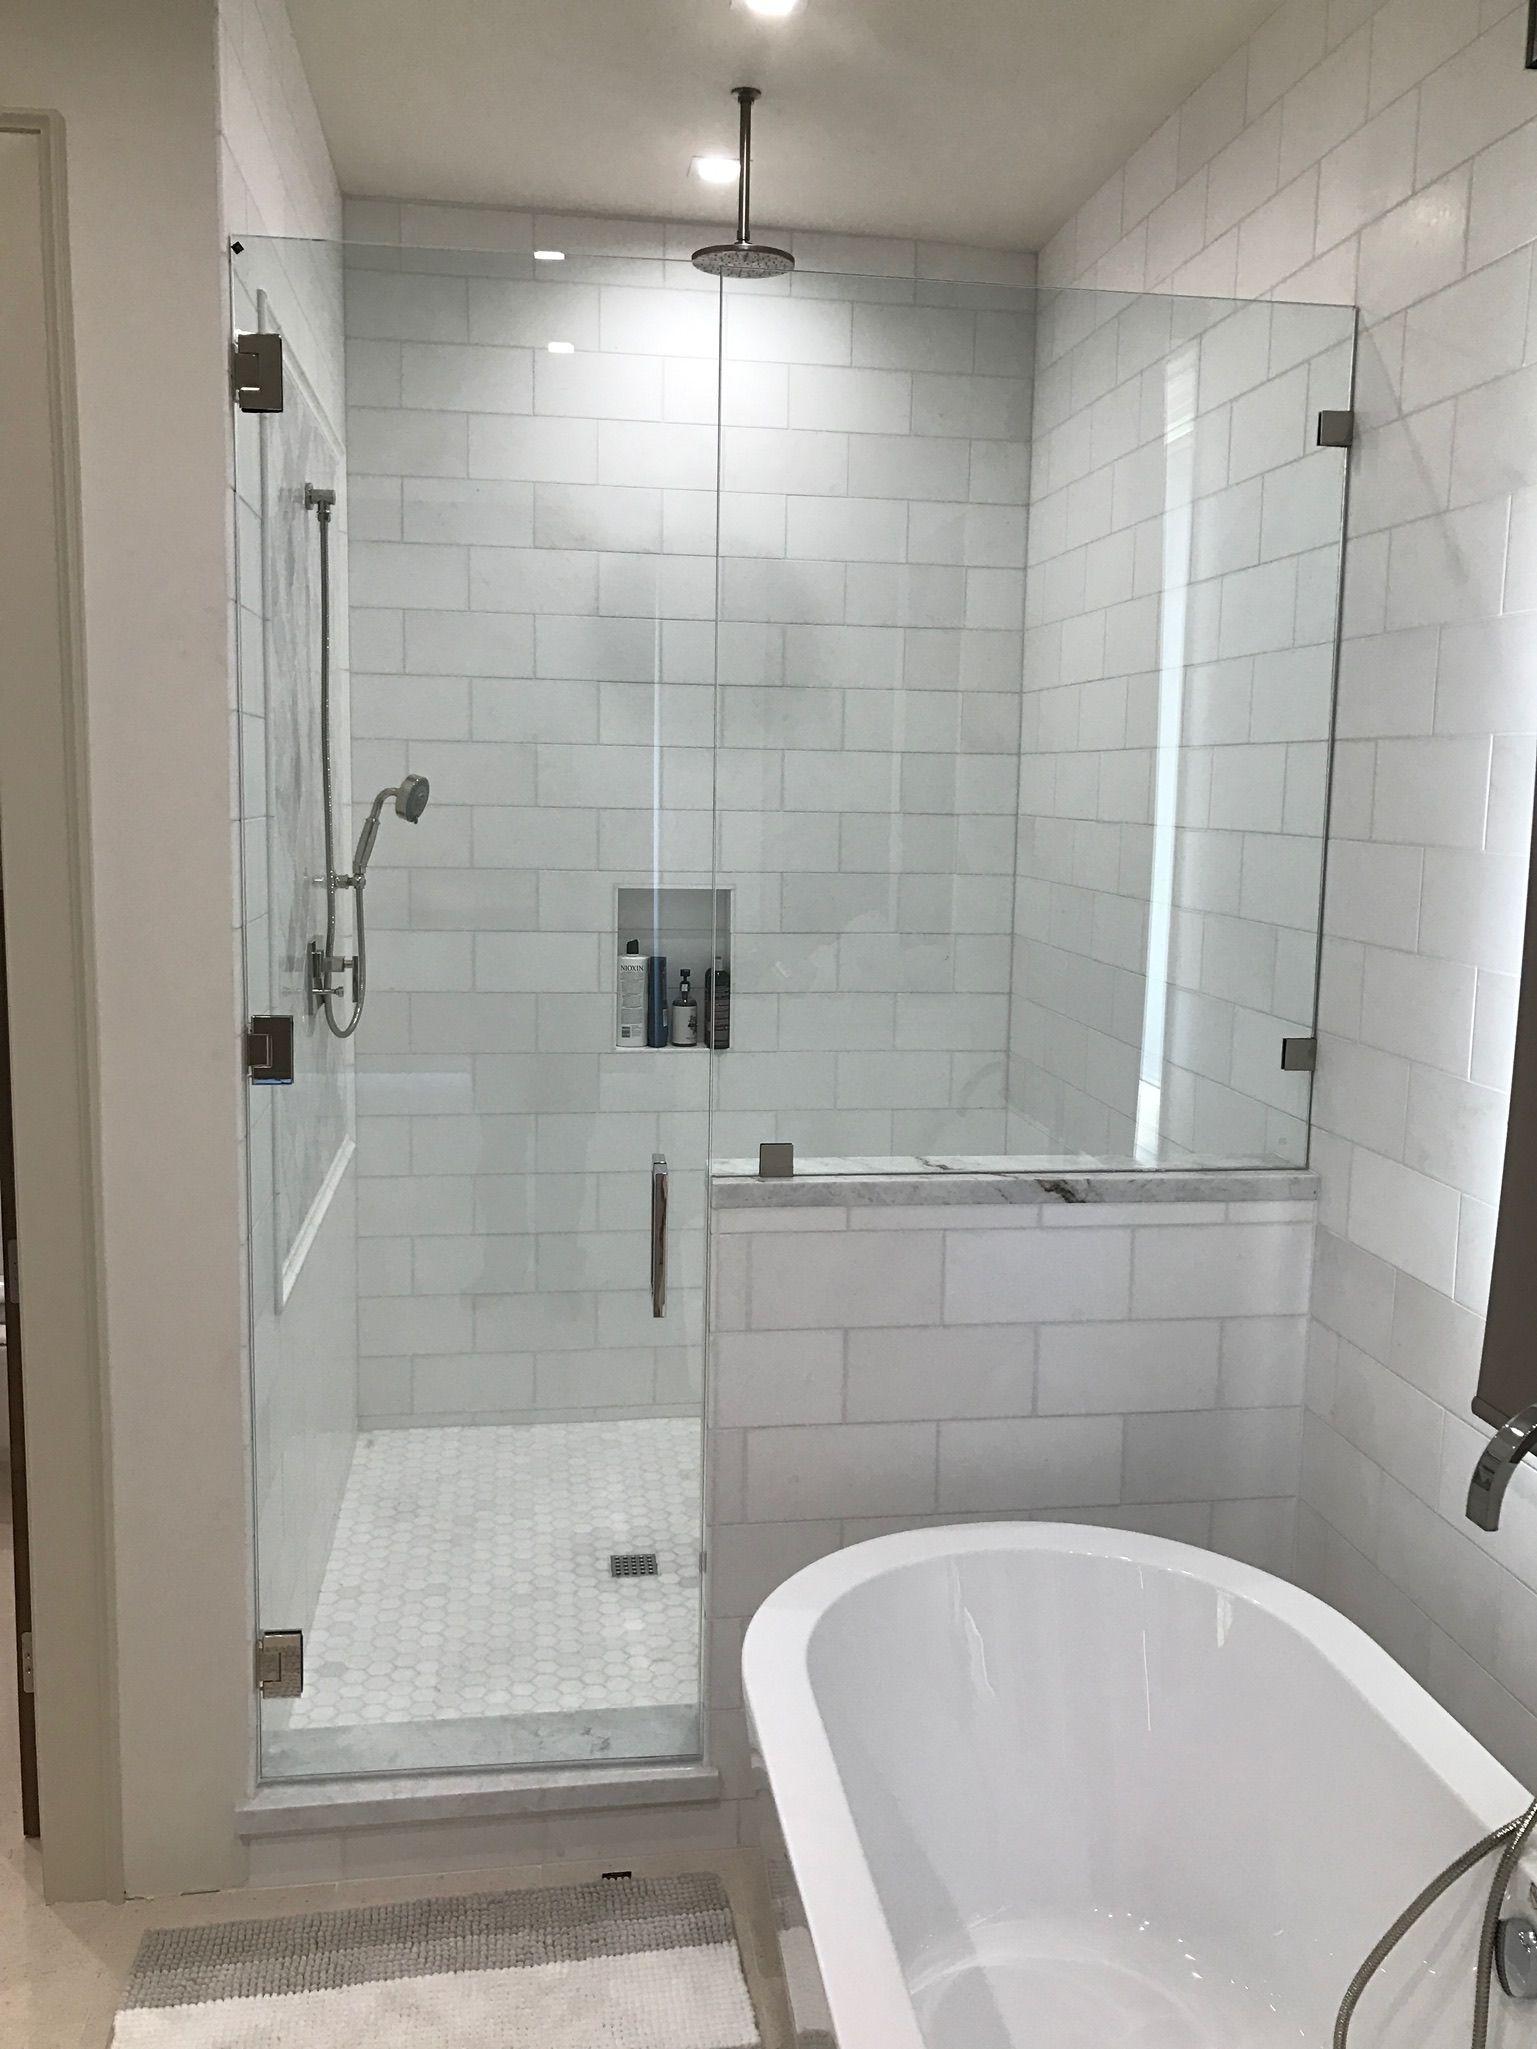 Corner Shower With Stand Alone Bathtub On The Side Bathroom Design Bathroom Design Layout Simple Bathroom